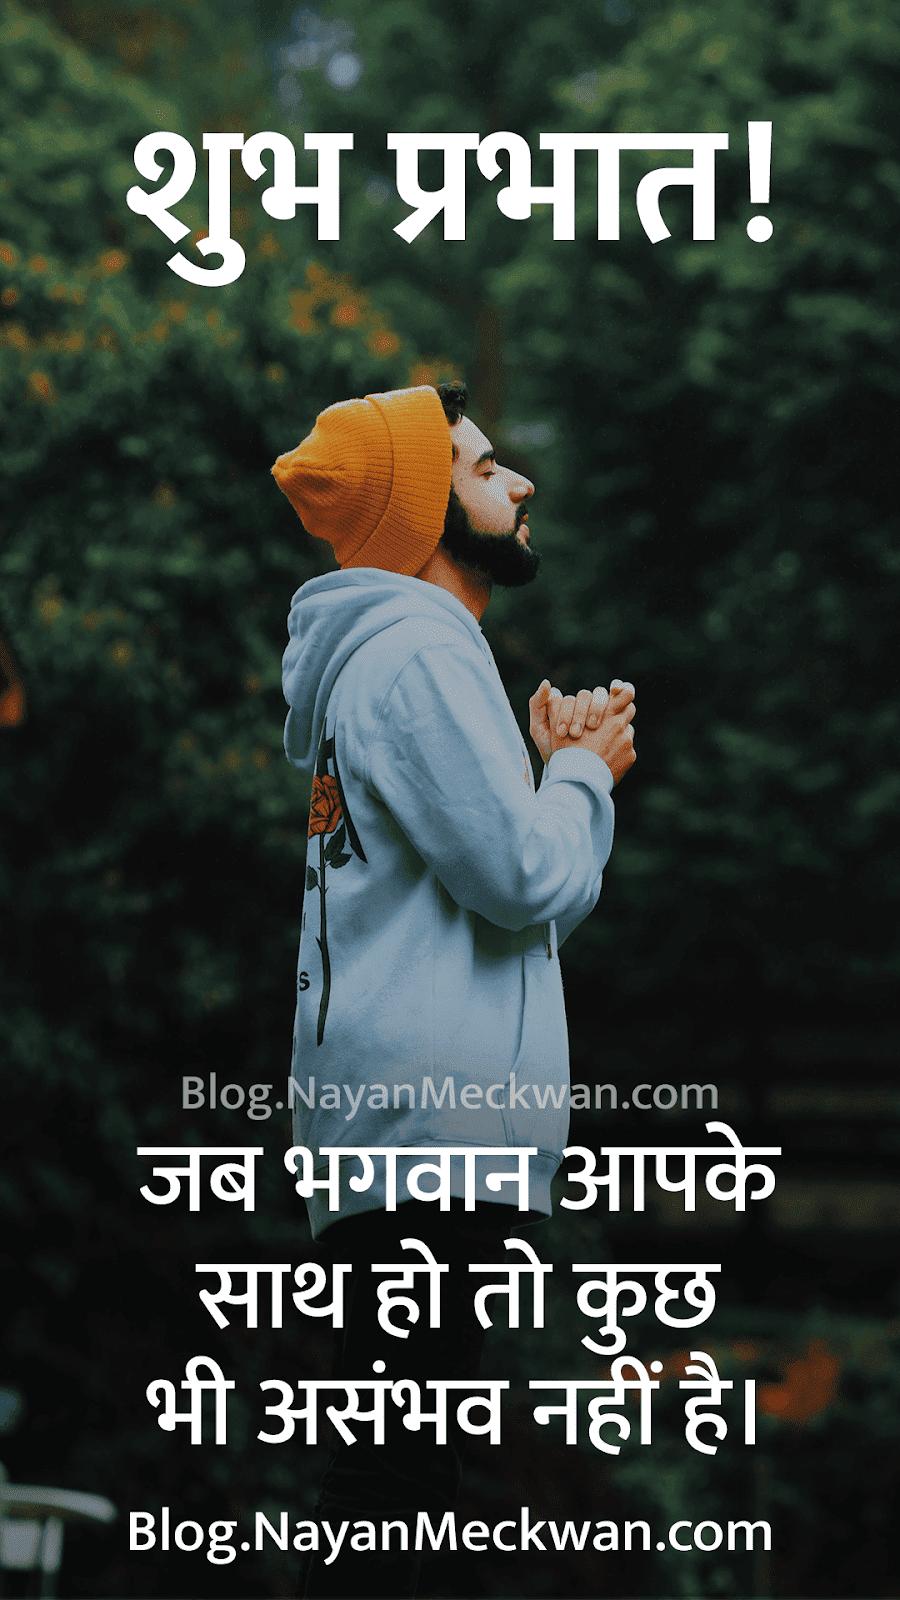 Beautiful god quotes in hindi Good morning motivational quotes images in hindi | सुप्रभात हिंदी सुविचार